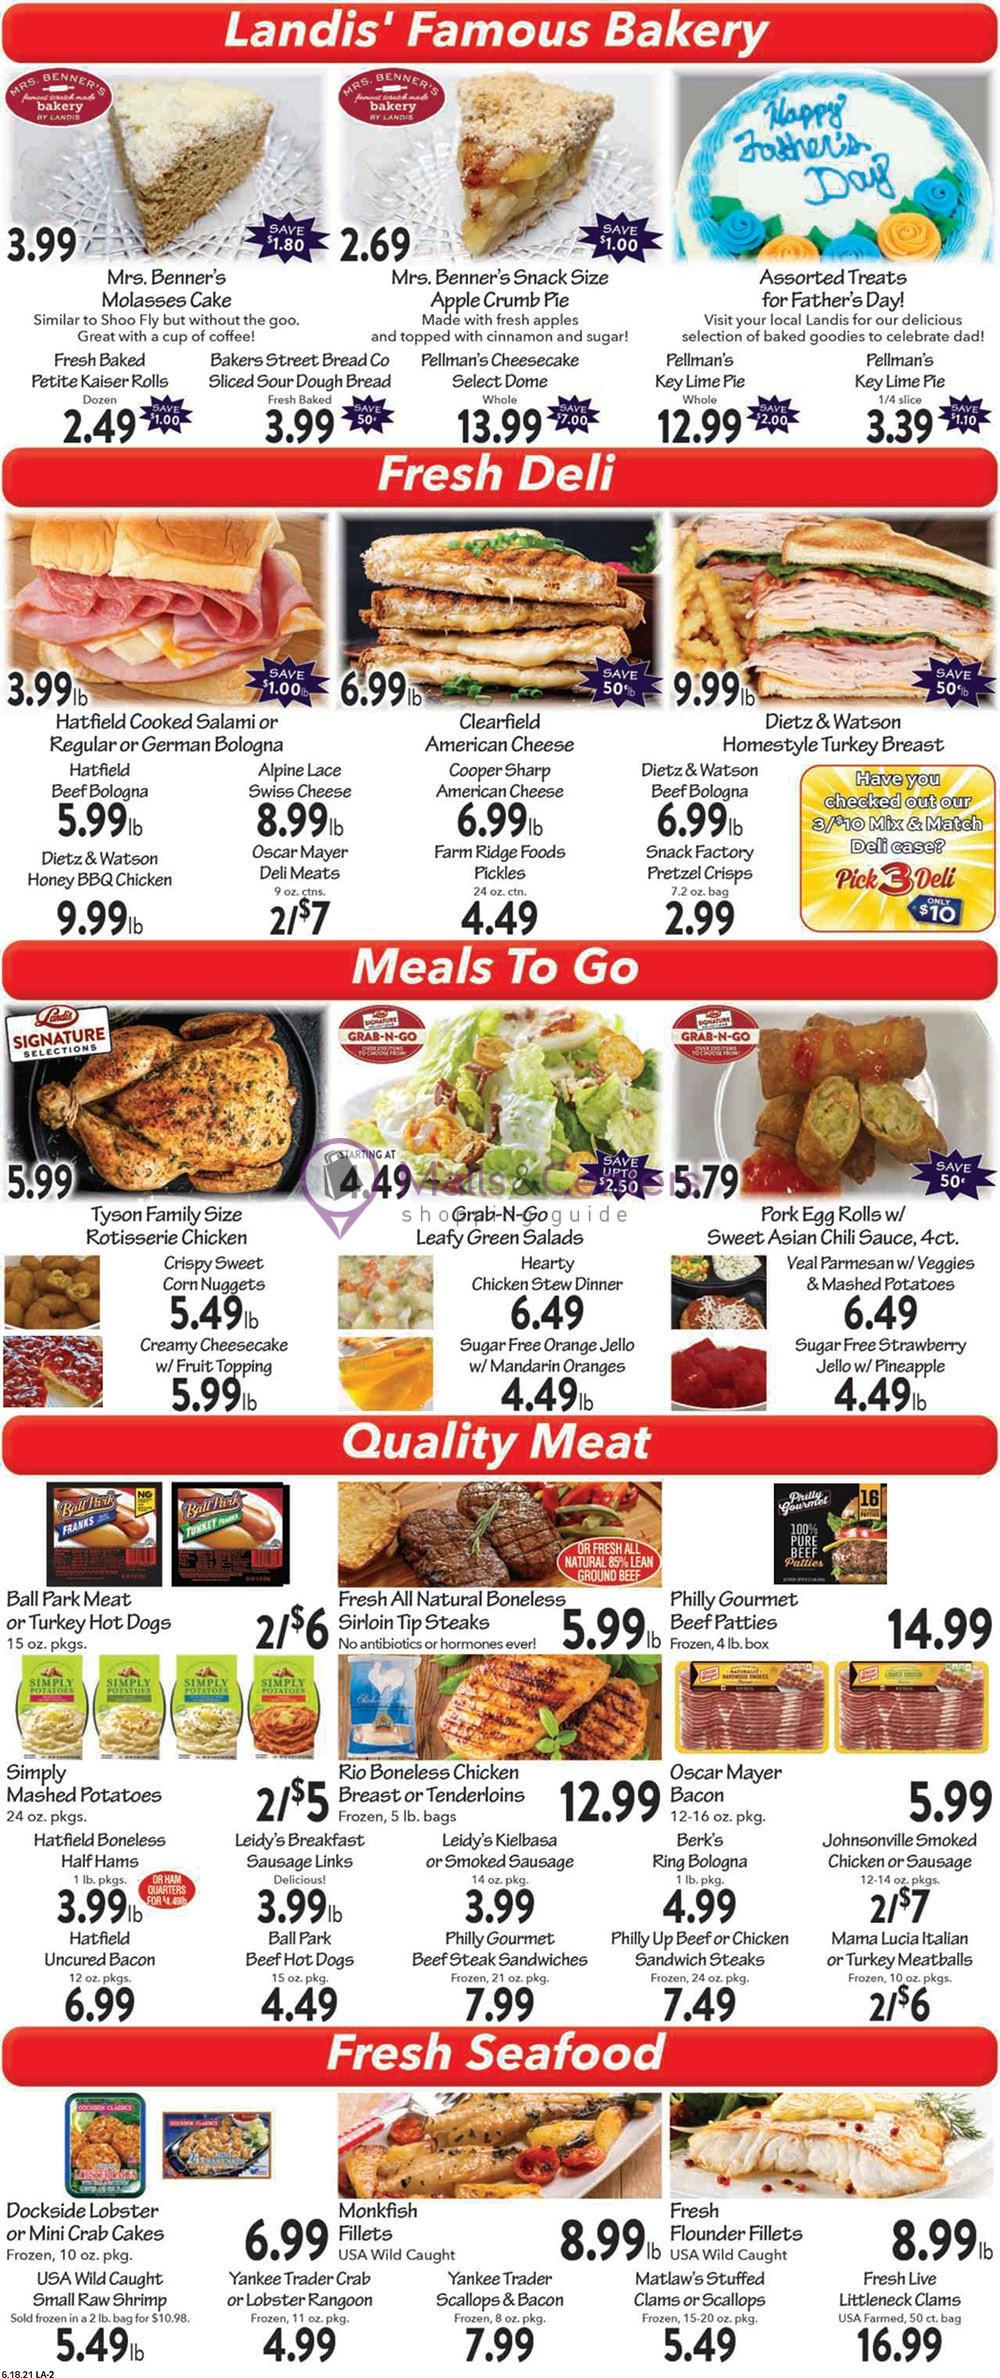 weekly ads Landis Supermarket - page 1 - mallscenters.com